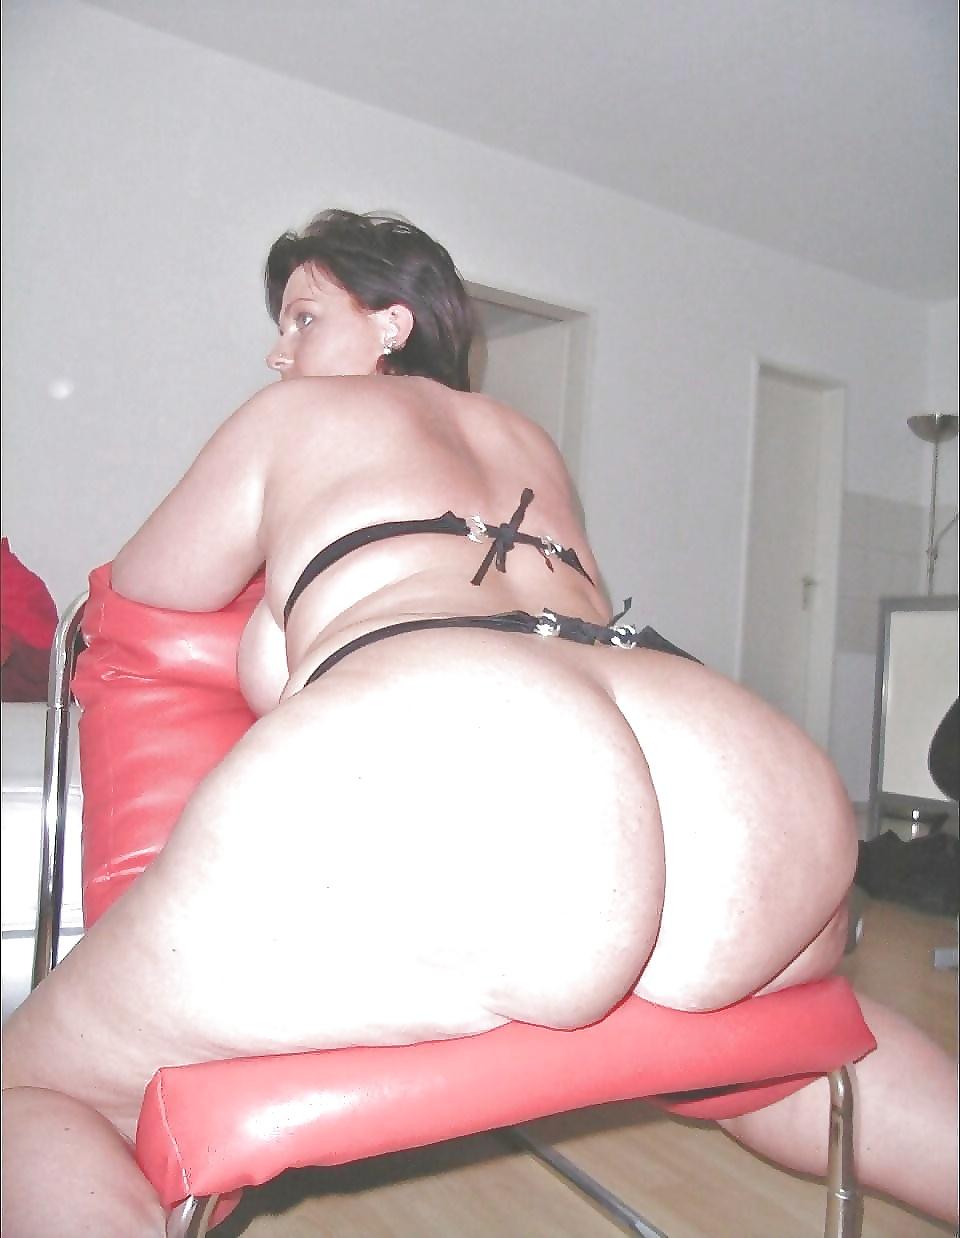 big-ass-bbw-booty-grannys-nude-anal